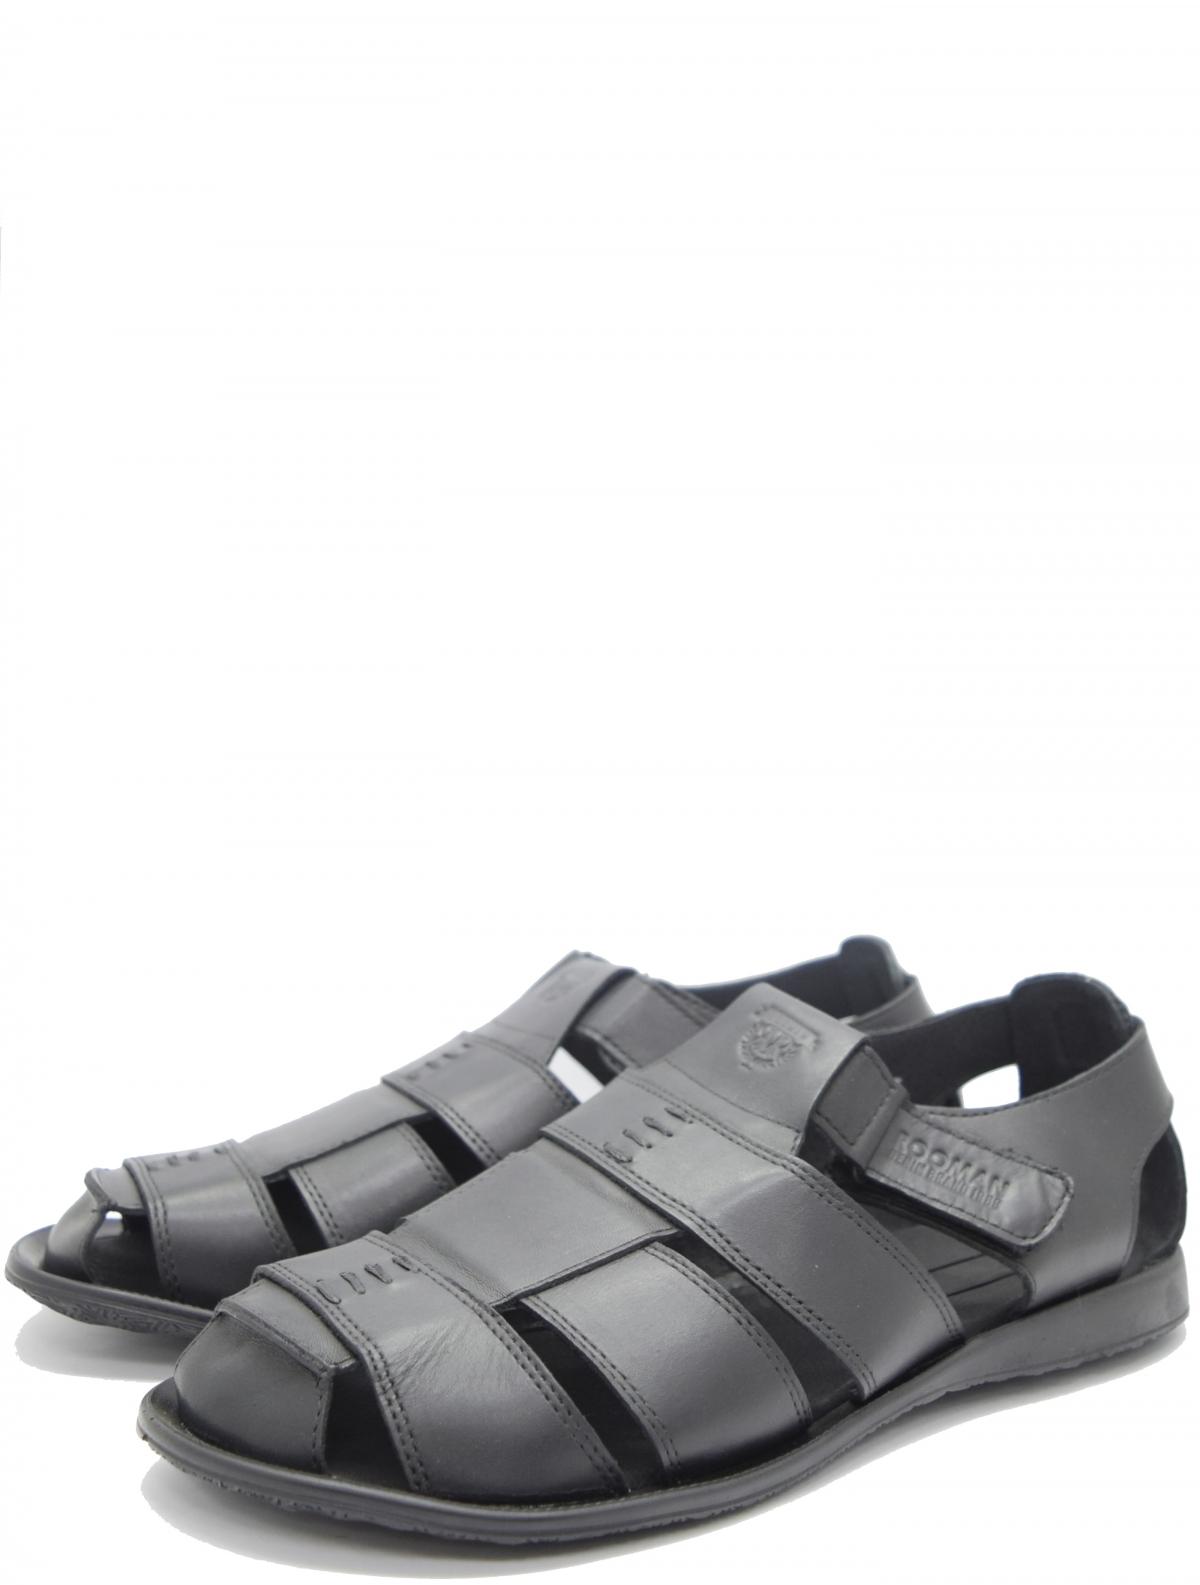 Rooman 901-060-N1K мужские сандали